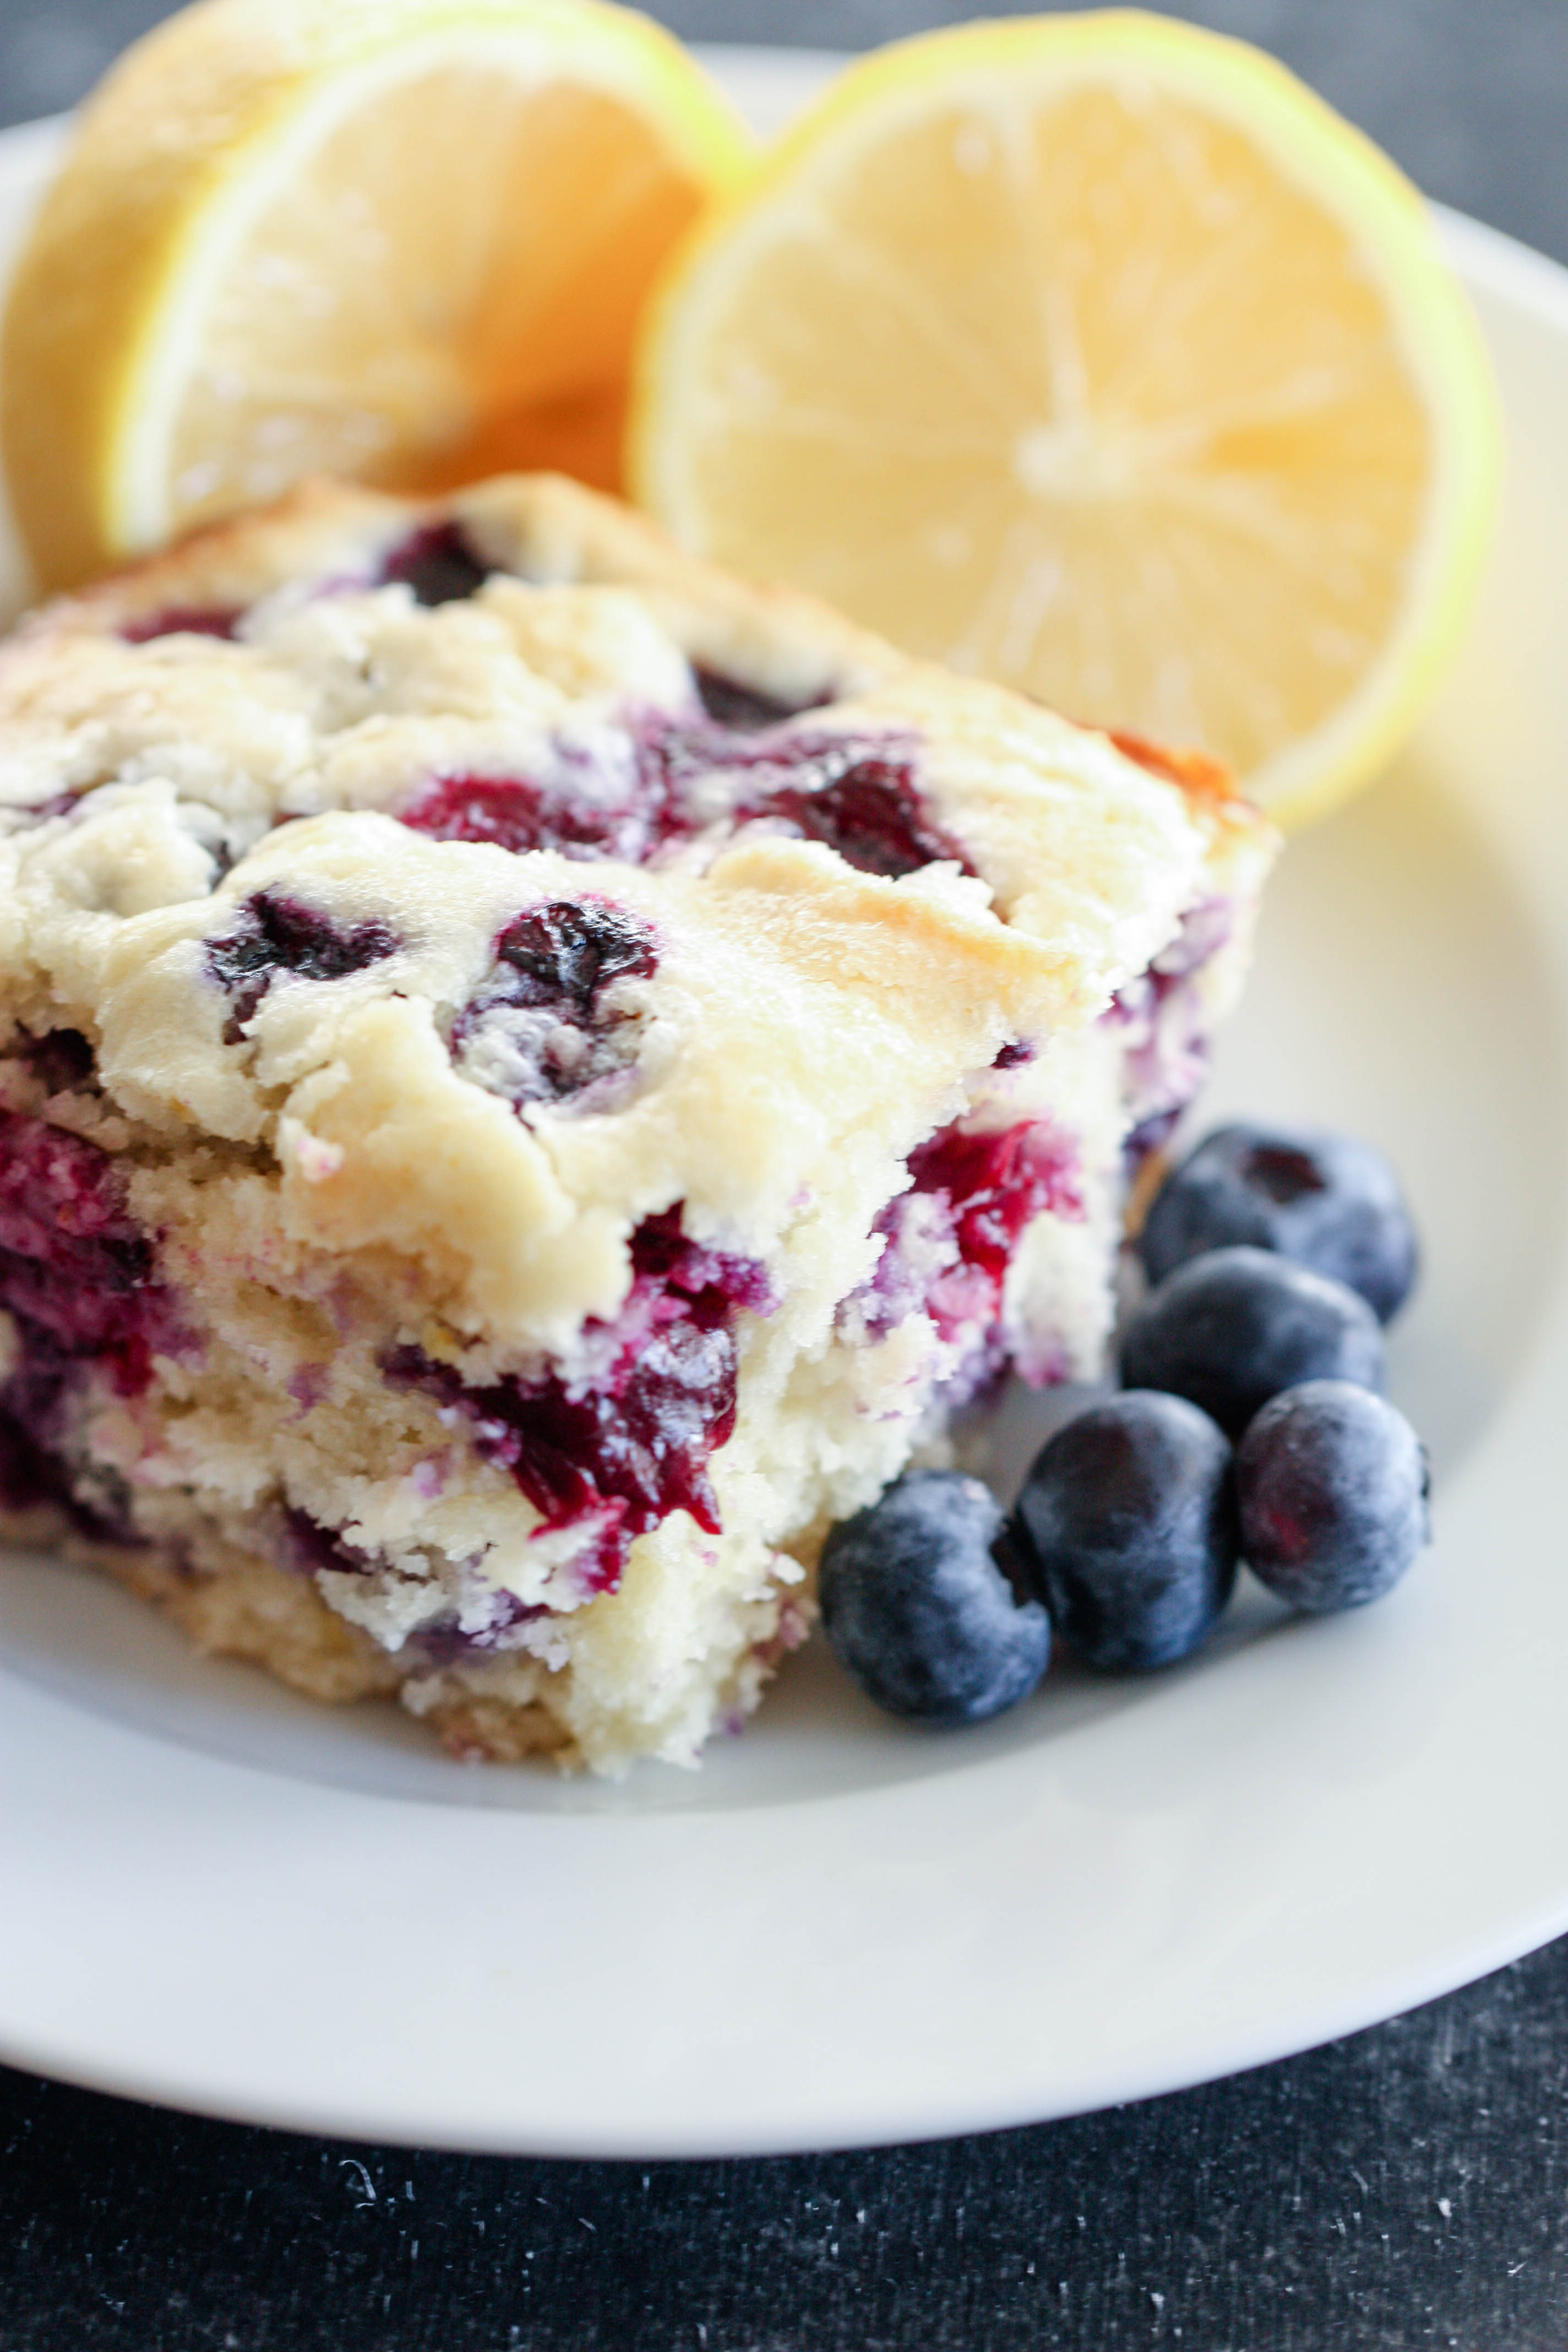 Lemon Blueberry Cake slice plated.